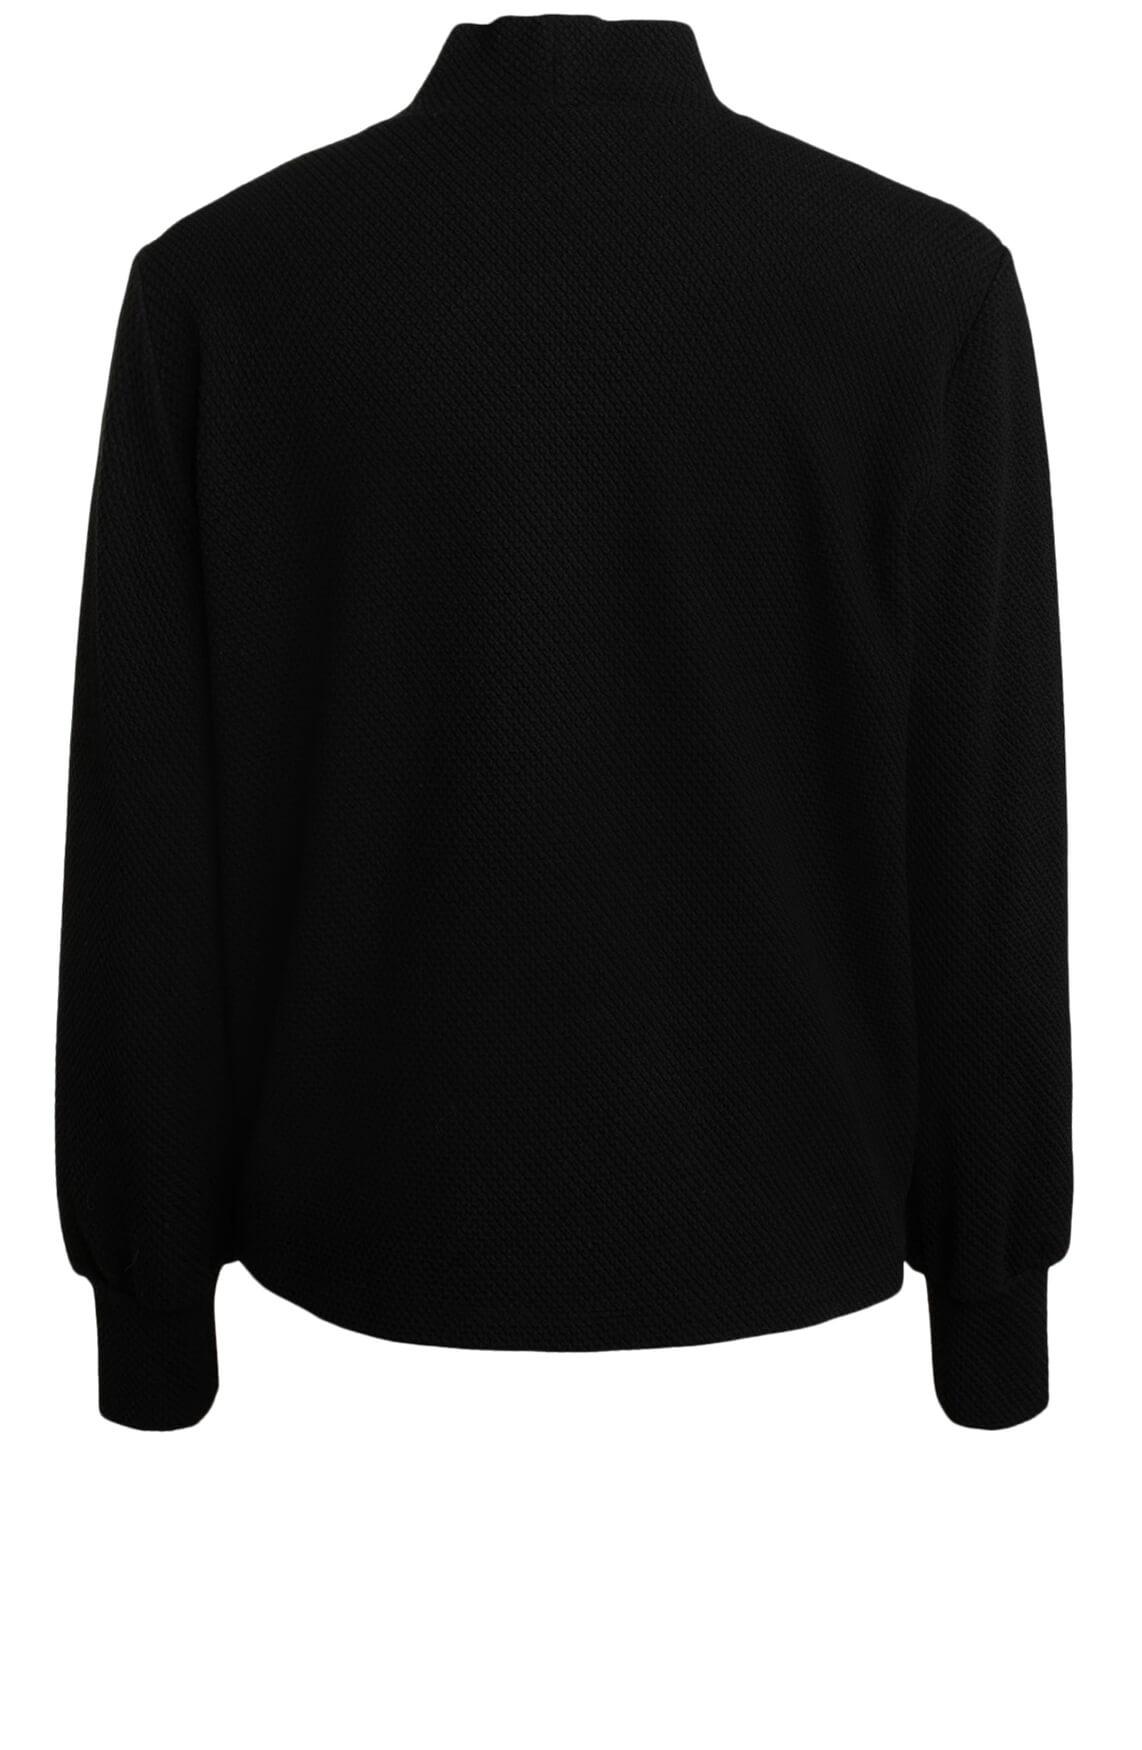 Anna Dames Sweater met knopen zwart